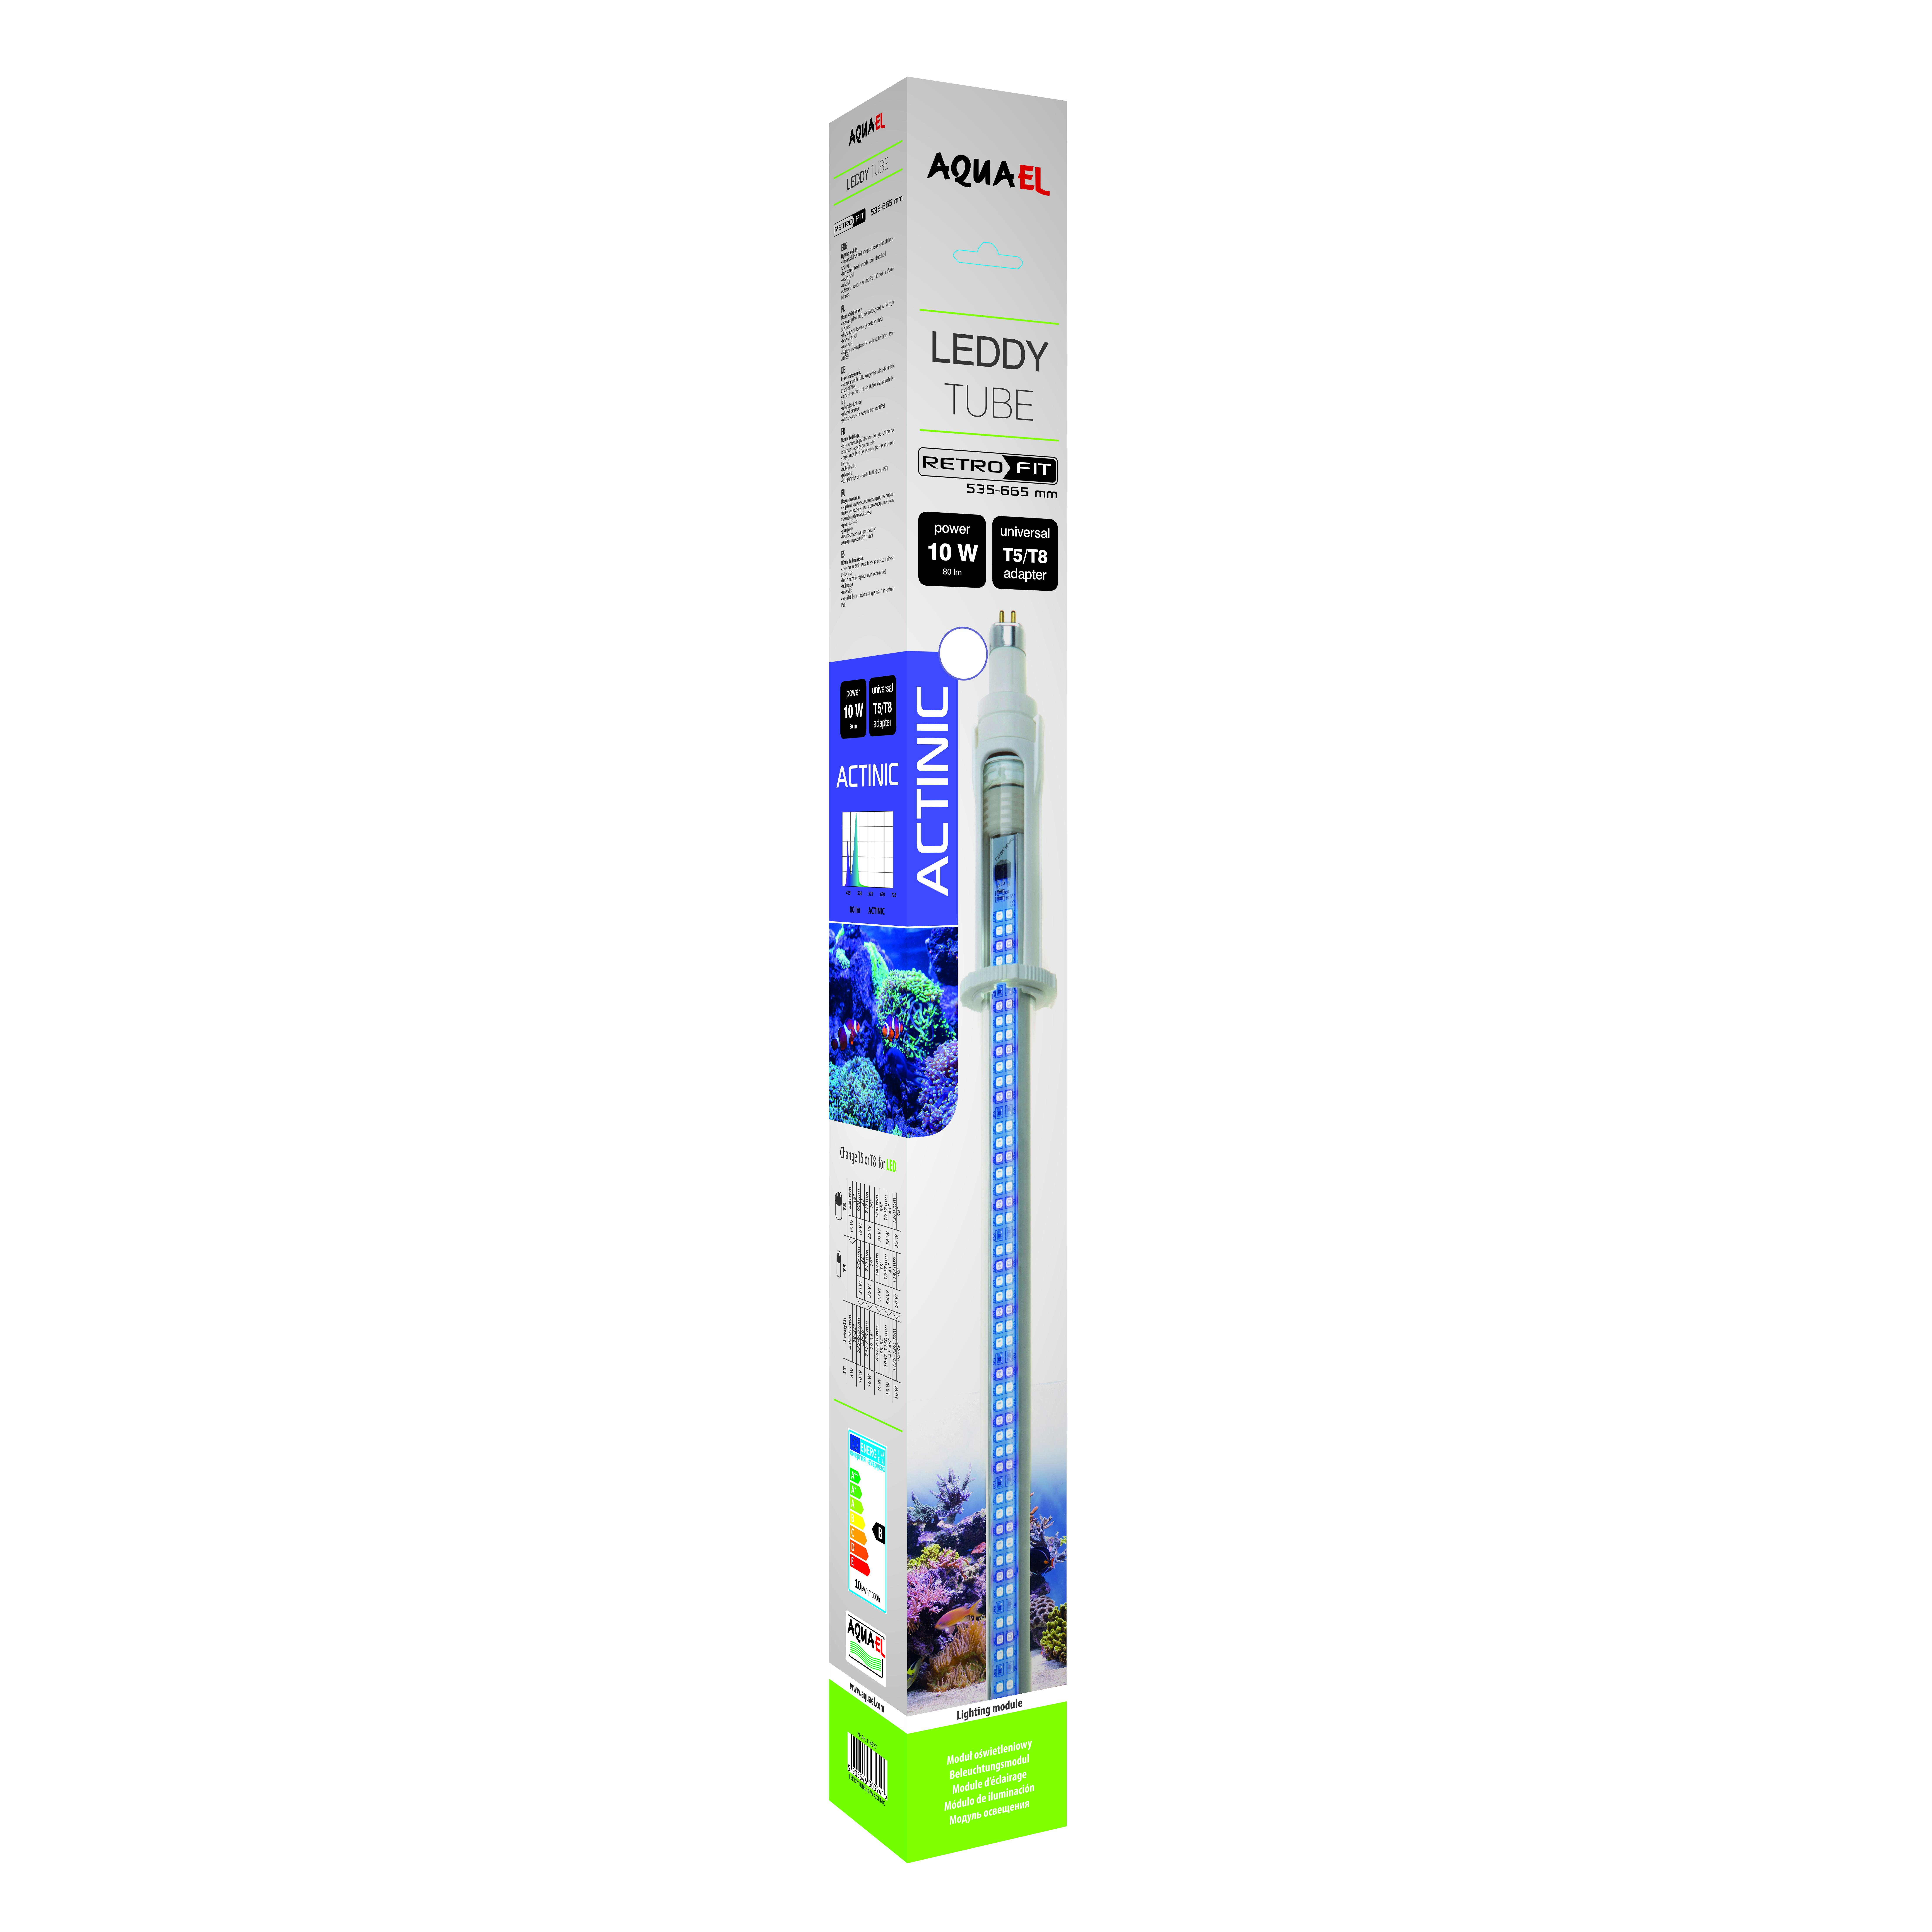 Aquael Lysrör LED Universal Actinic